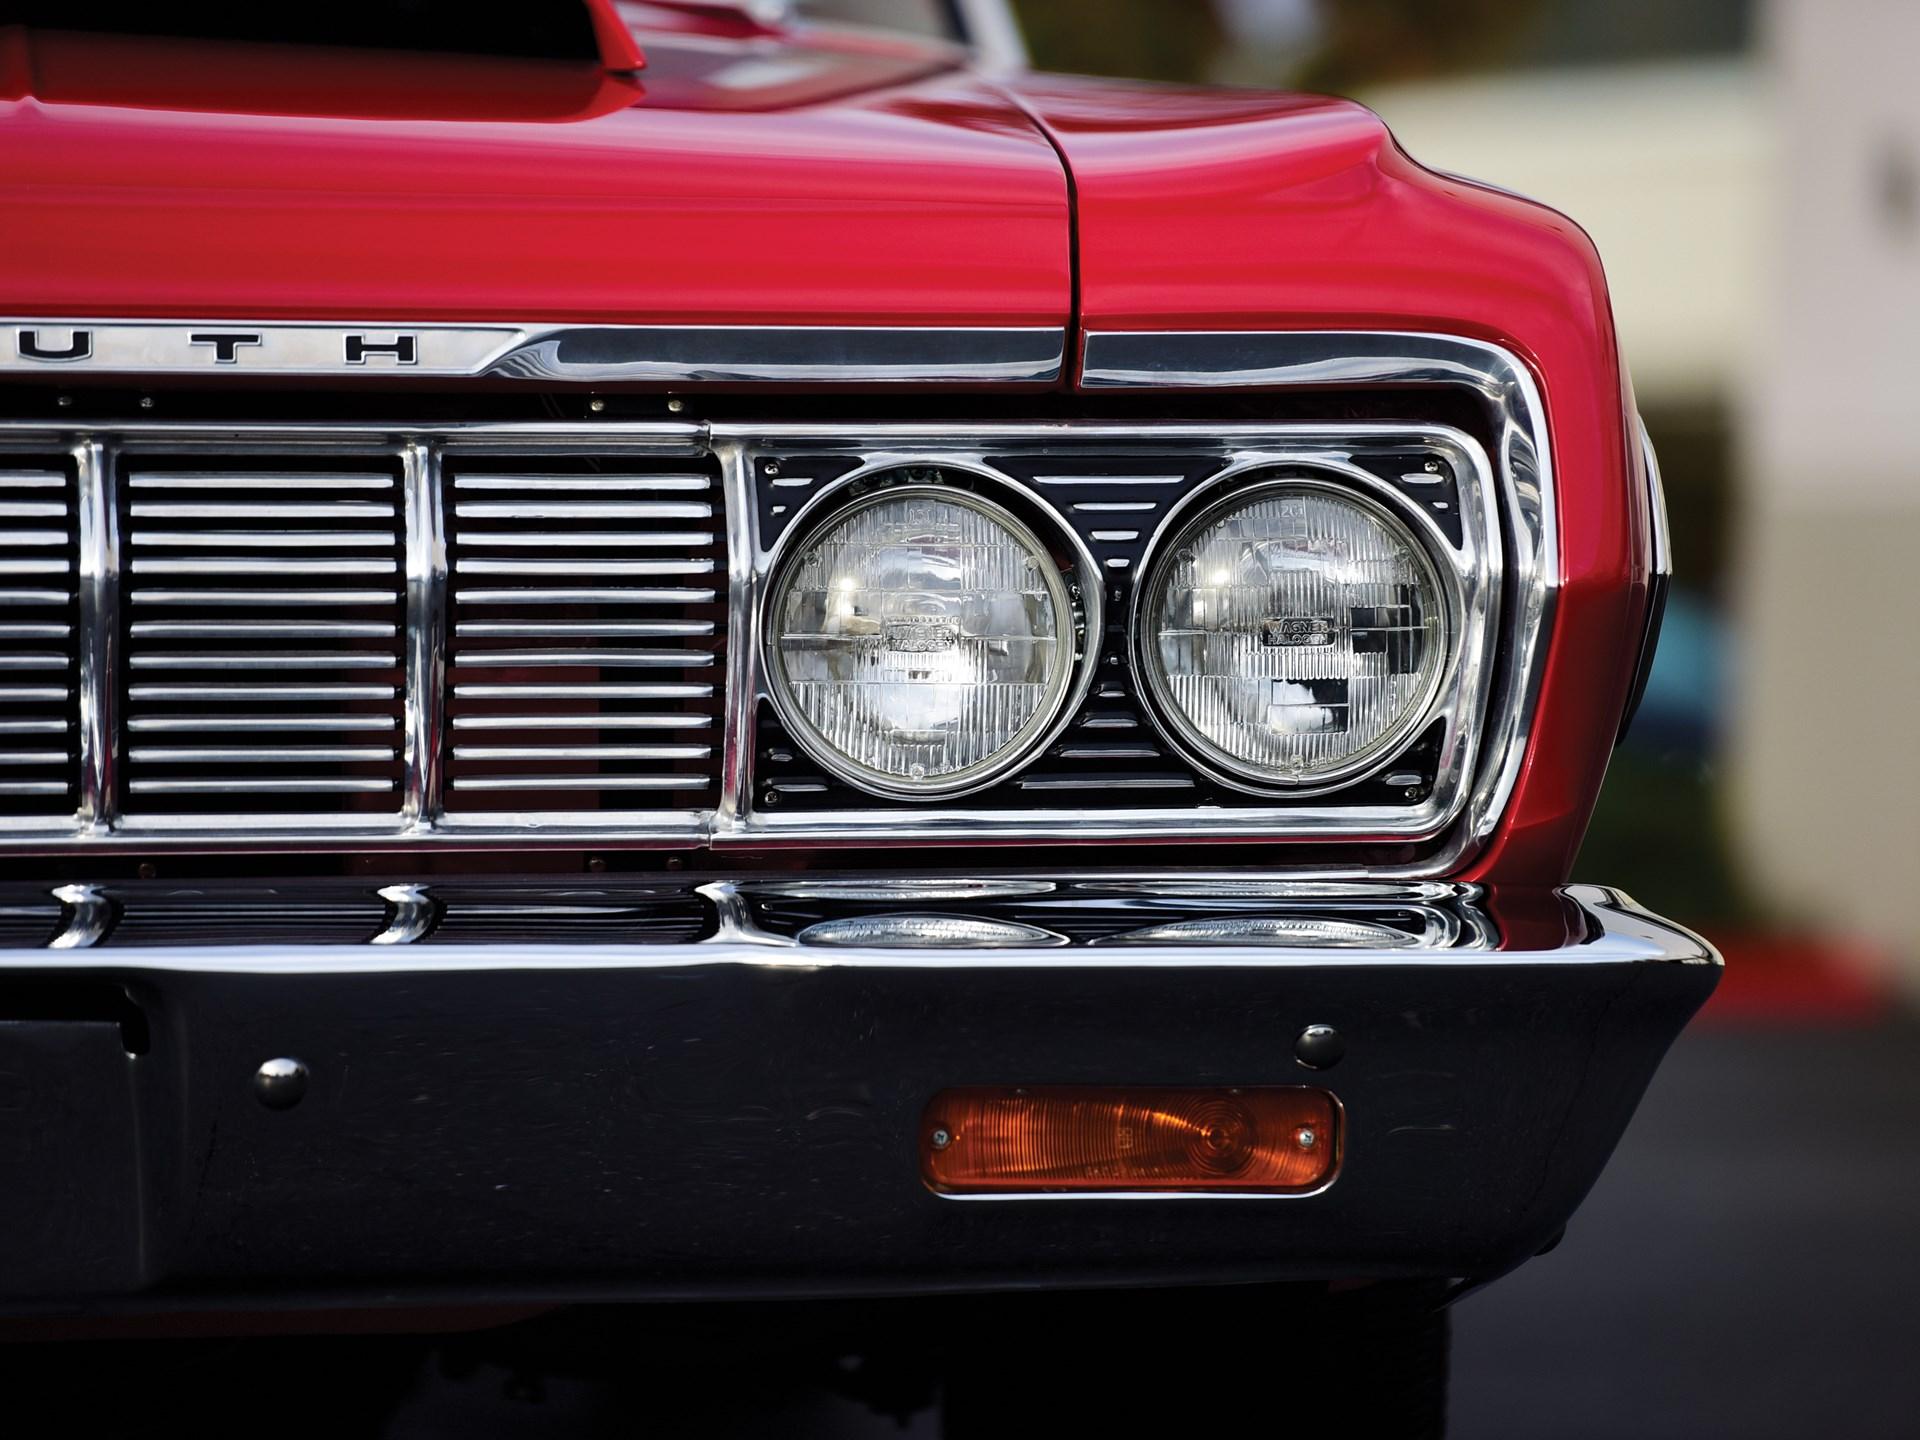 1964 Plymouth Belvedere Race Hemi